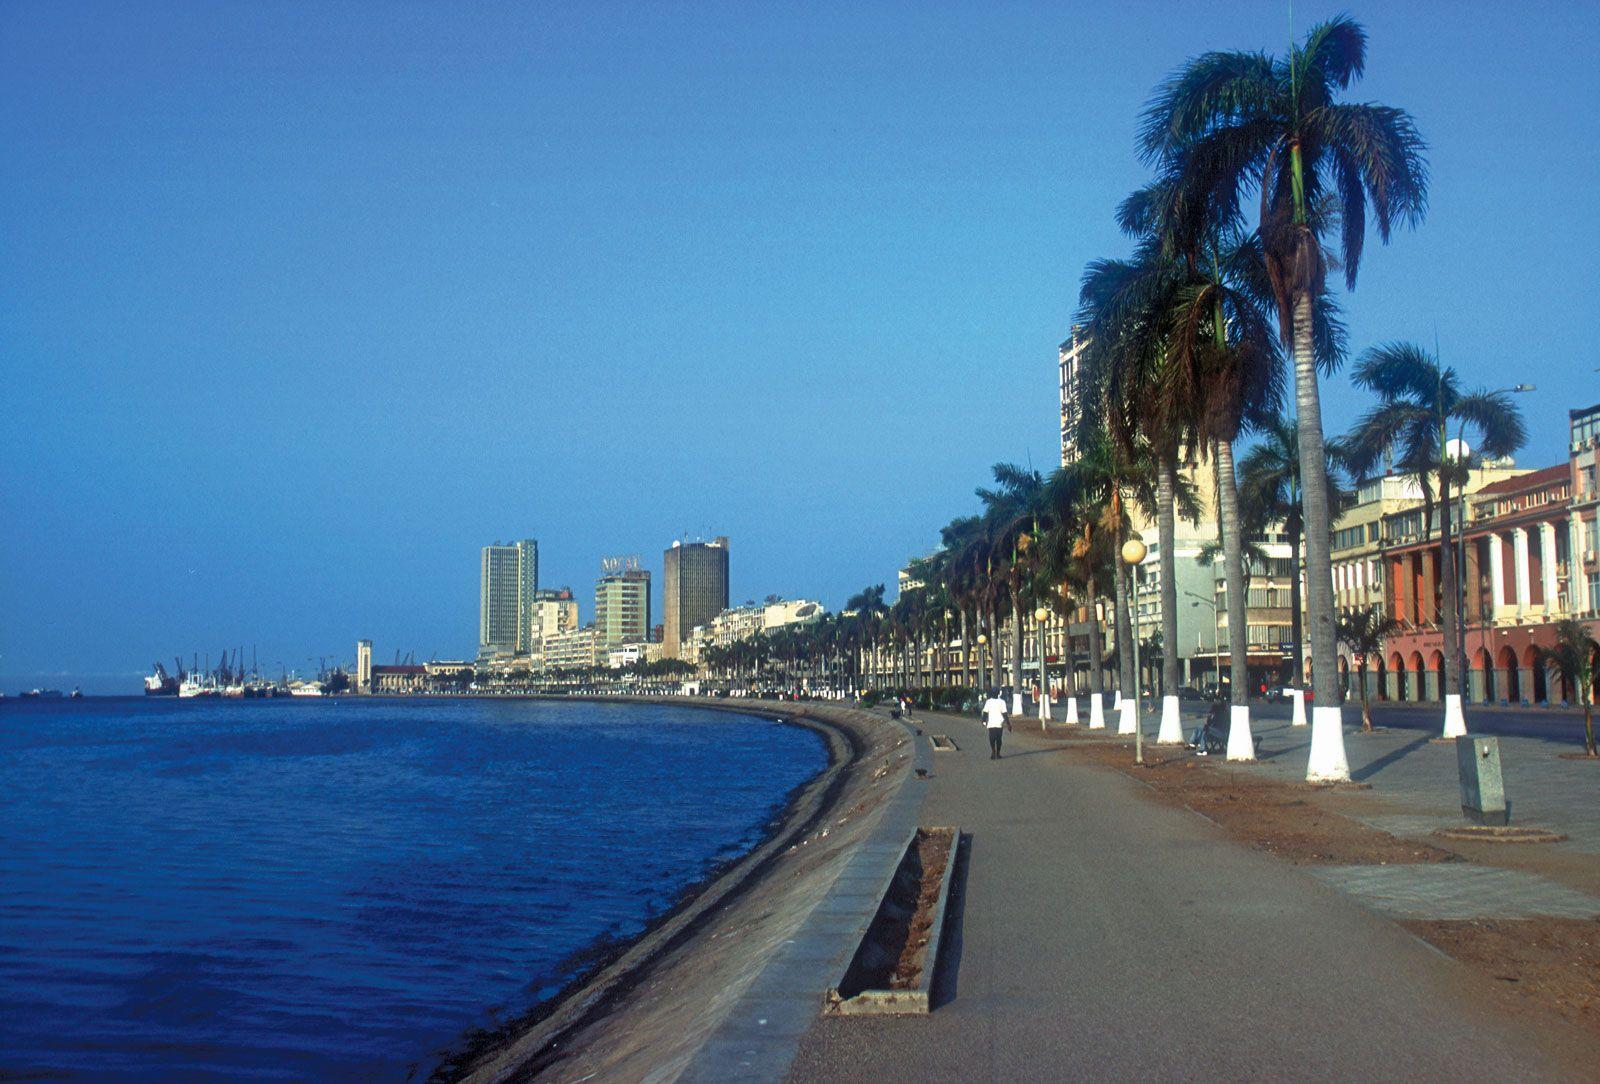 Angola city best images